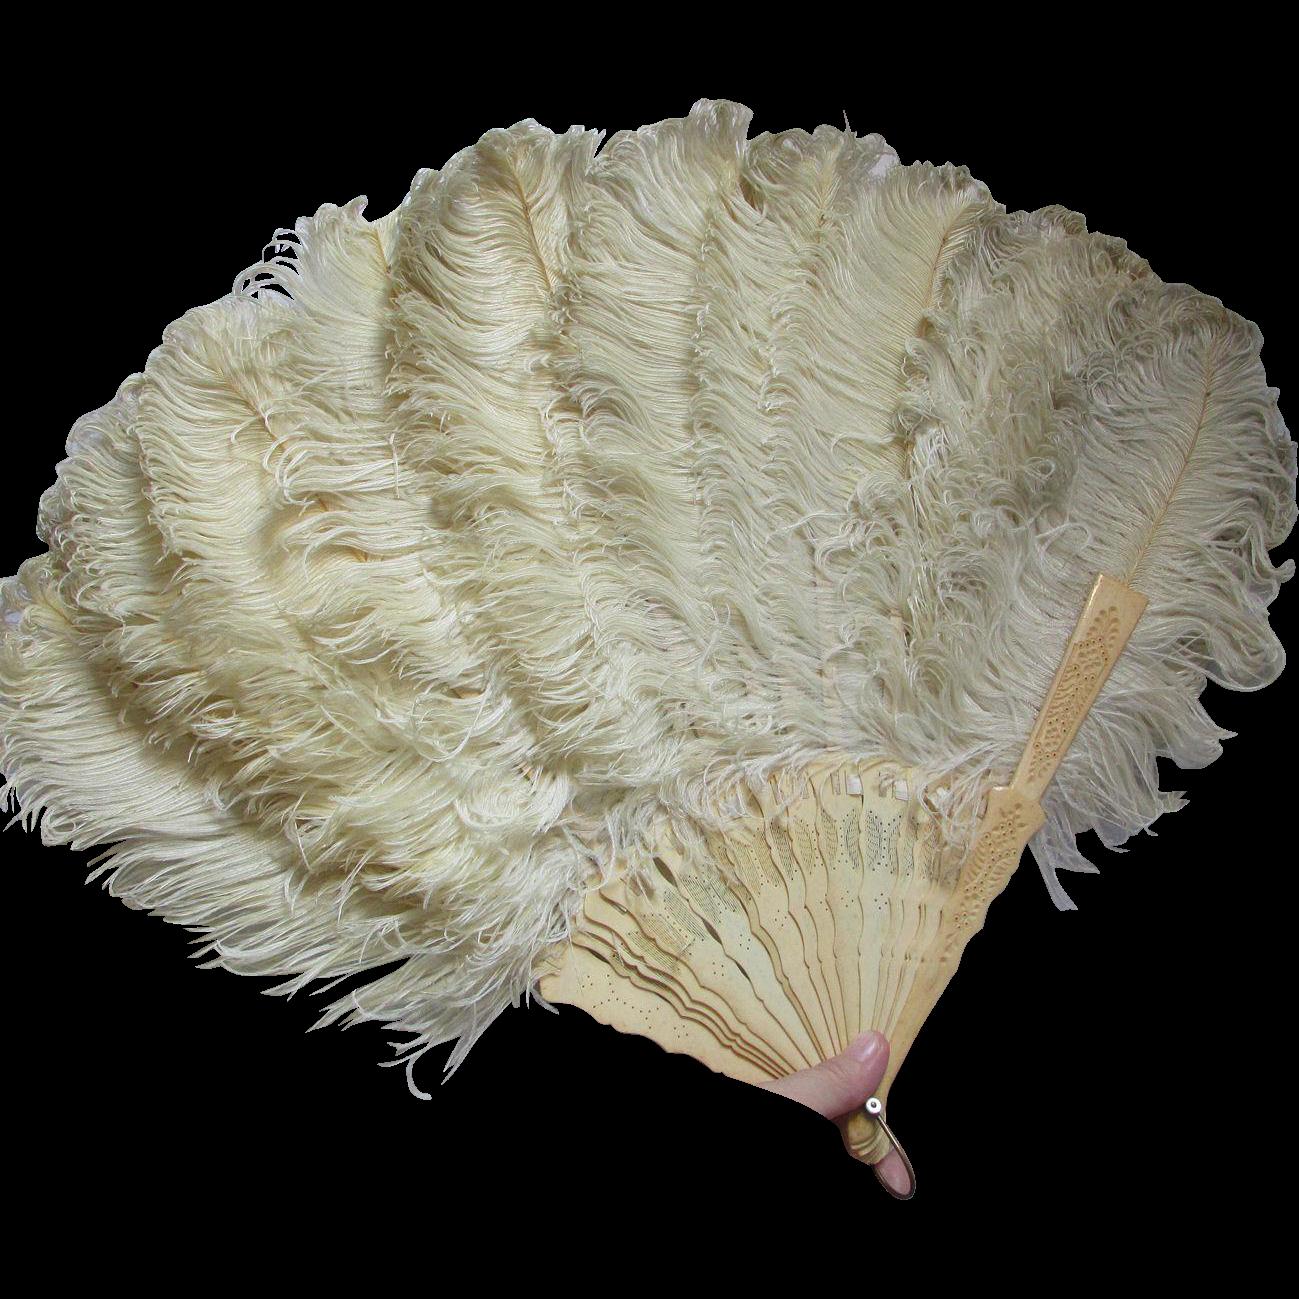 Victorian, Edwardian Ladies Ostrich Feather Fan, Formal Attire